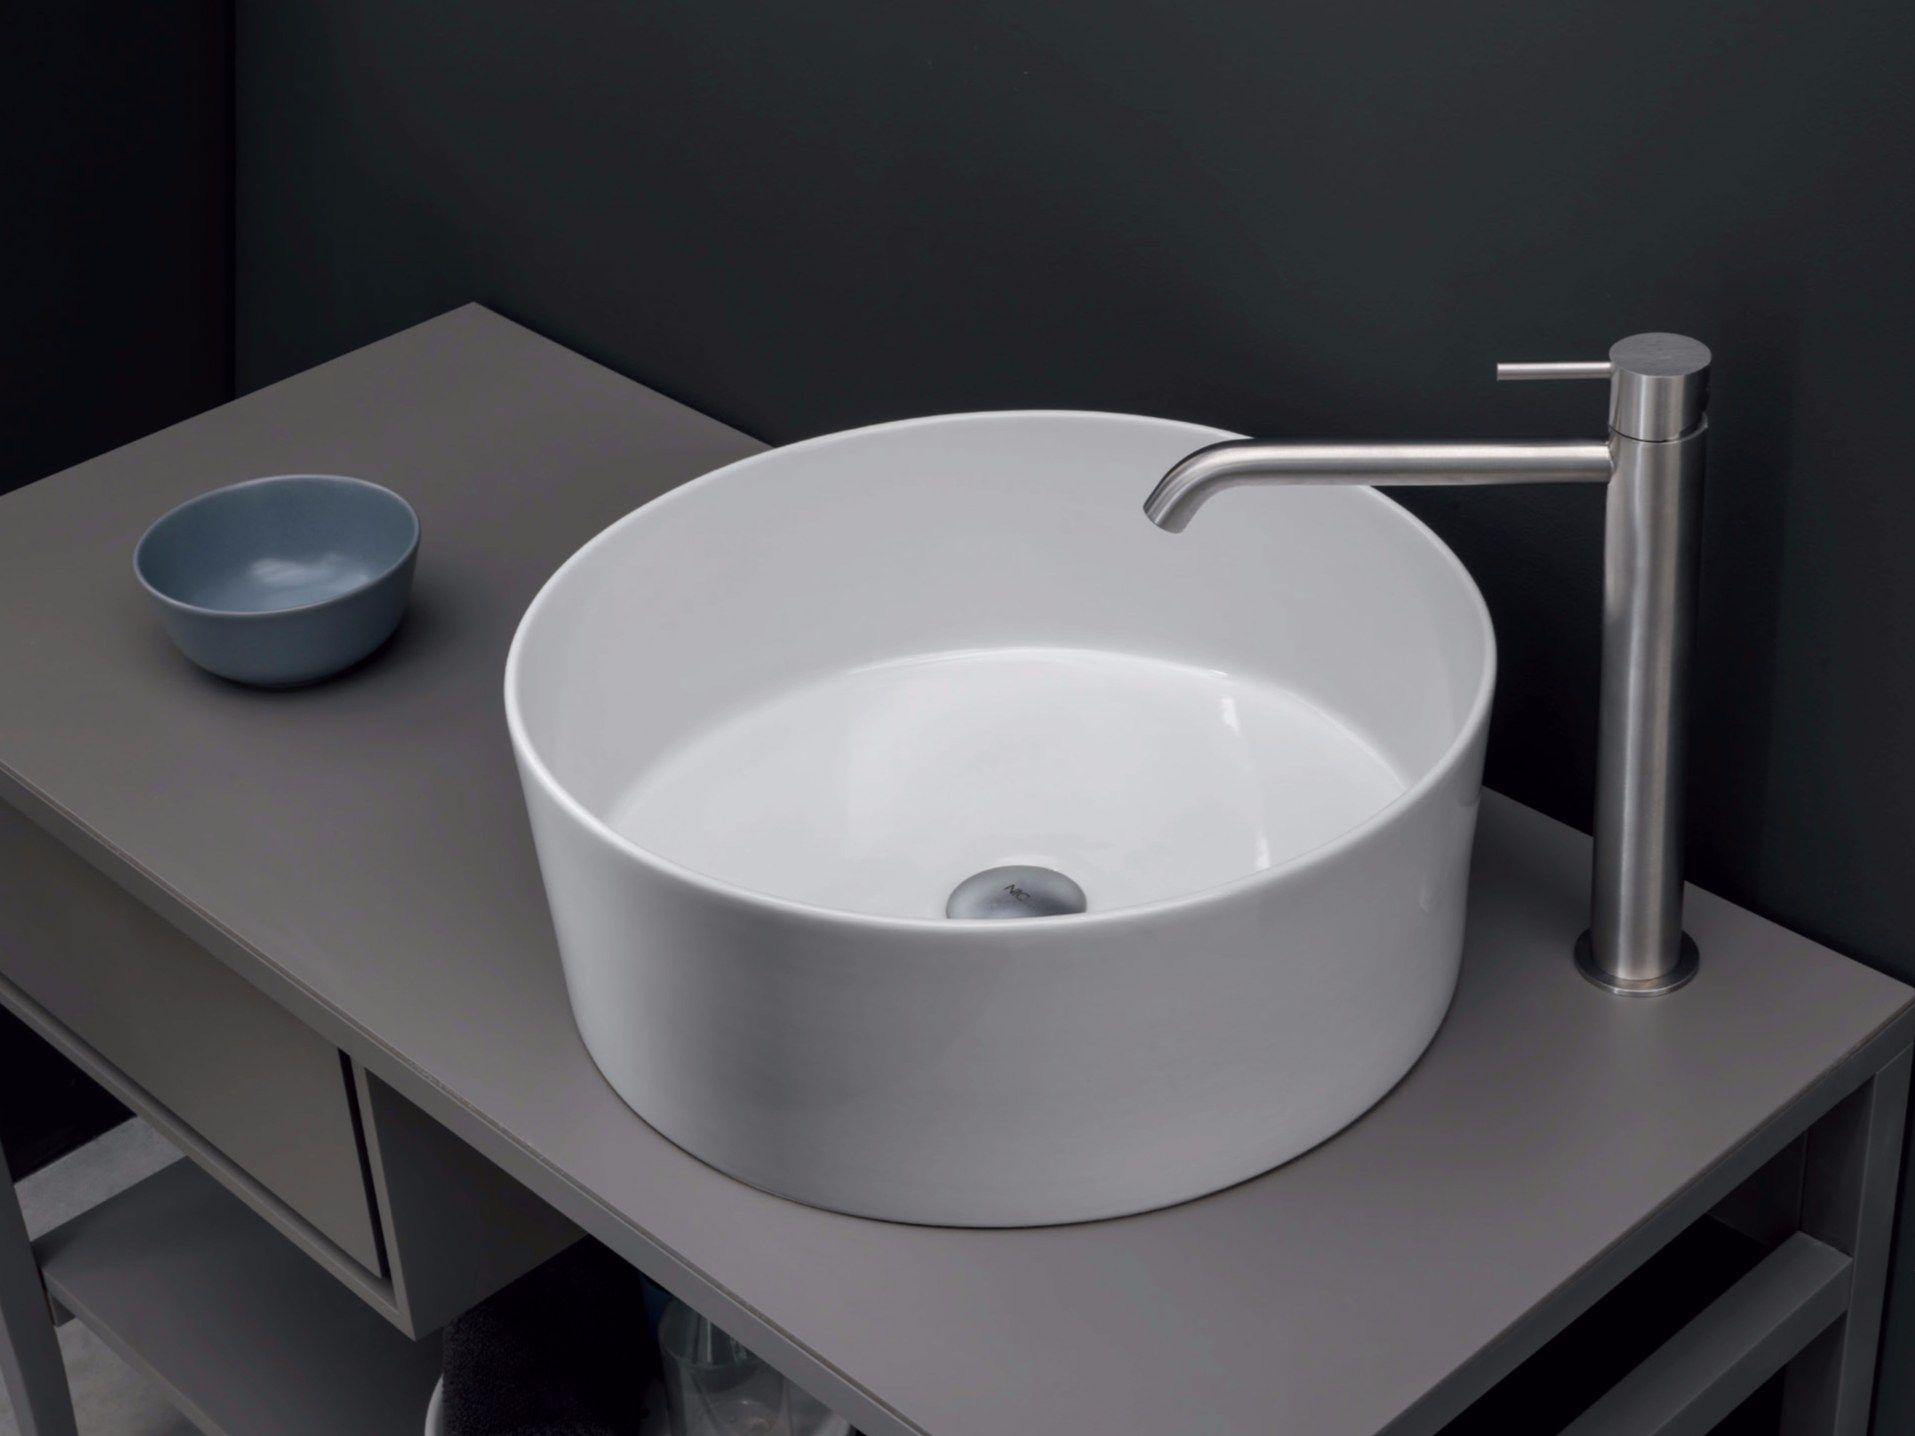 Lavabo sobre encimera redondo de cer mica ovvio vaso by for Catalogo nic design